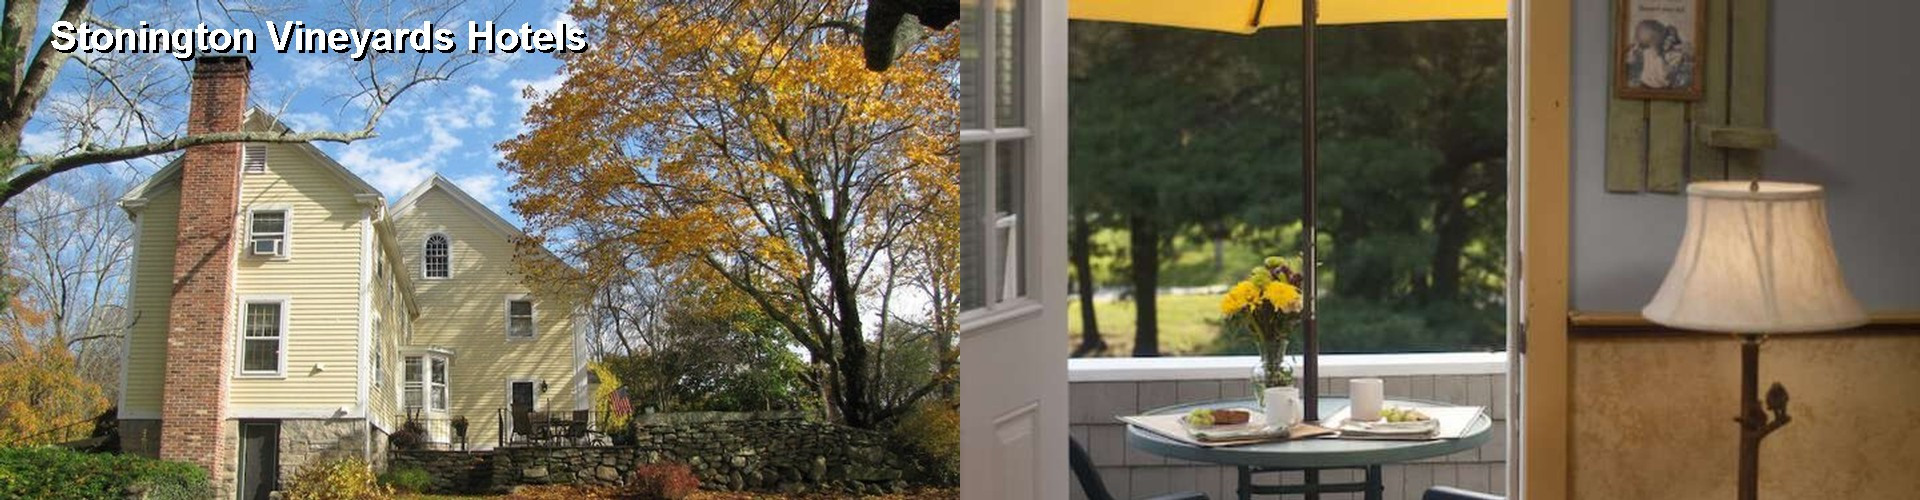 5 Best Hotels Near Stonington Vineyards